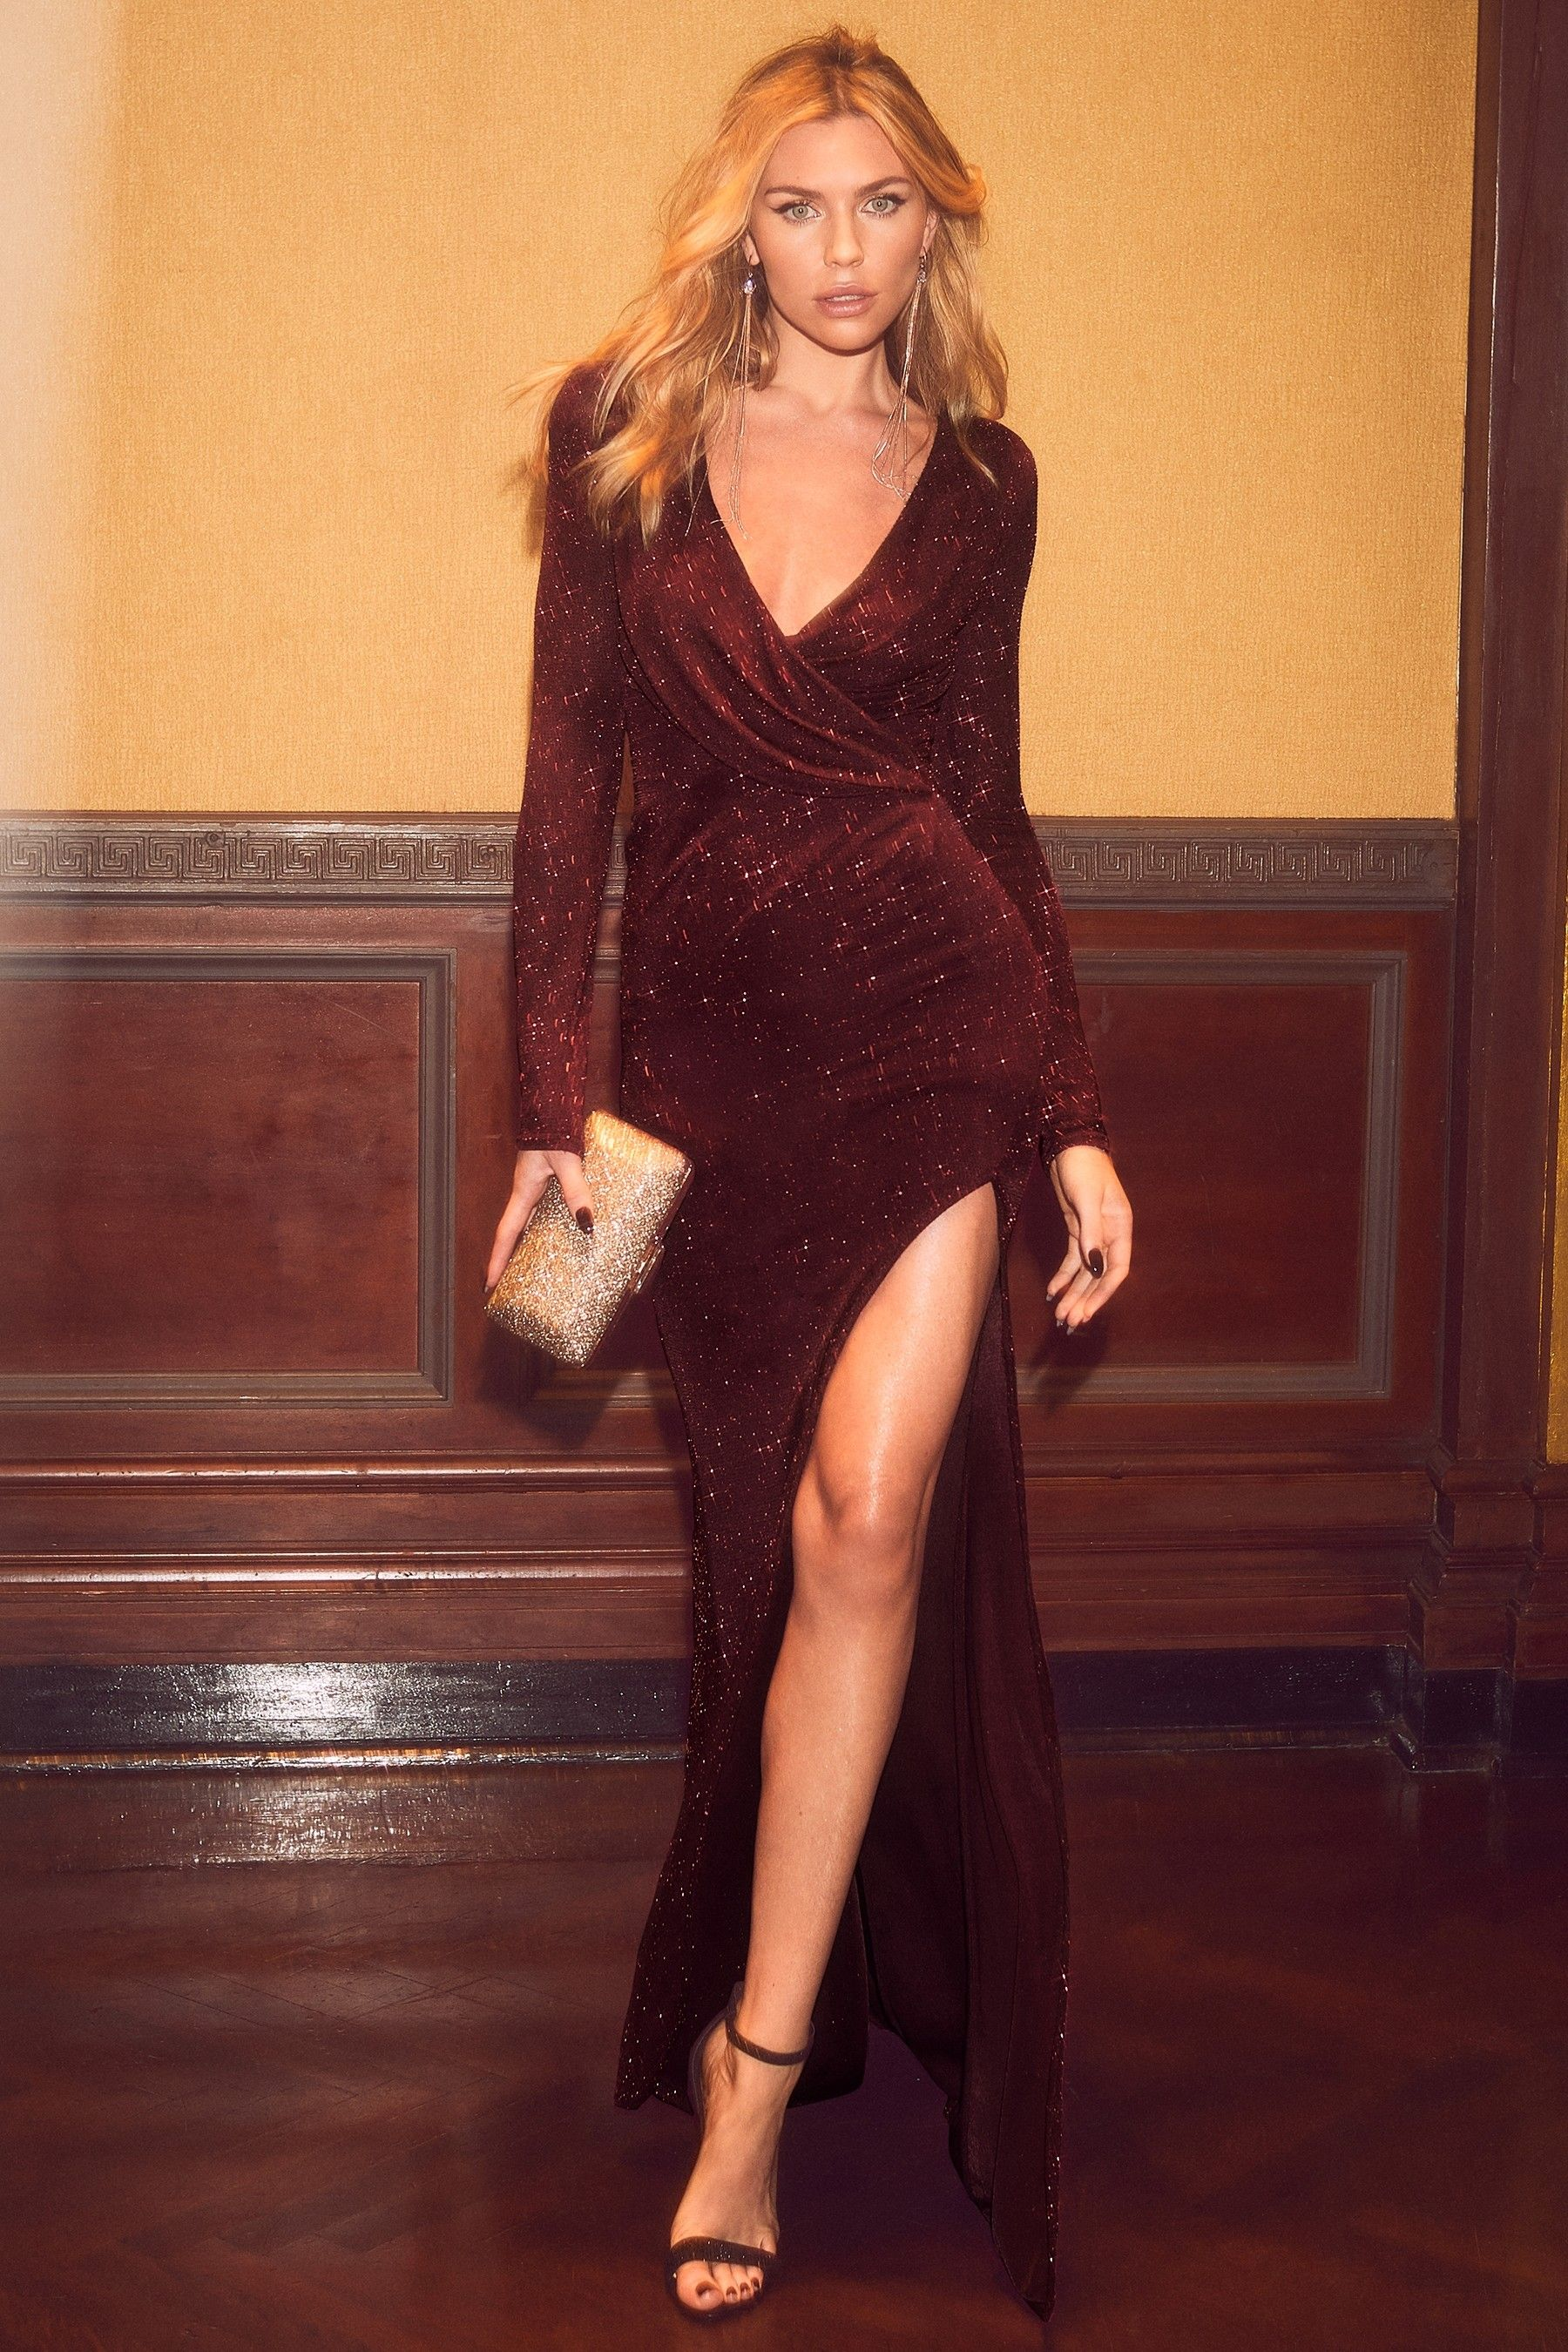 23a13465aab7 Womens Abbey Clancy x Lipsy Tall Glitter Wrap Maxi Dress - Red in ...